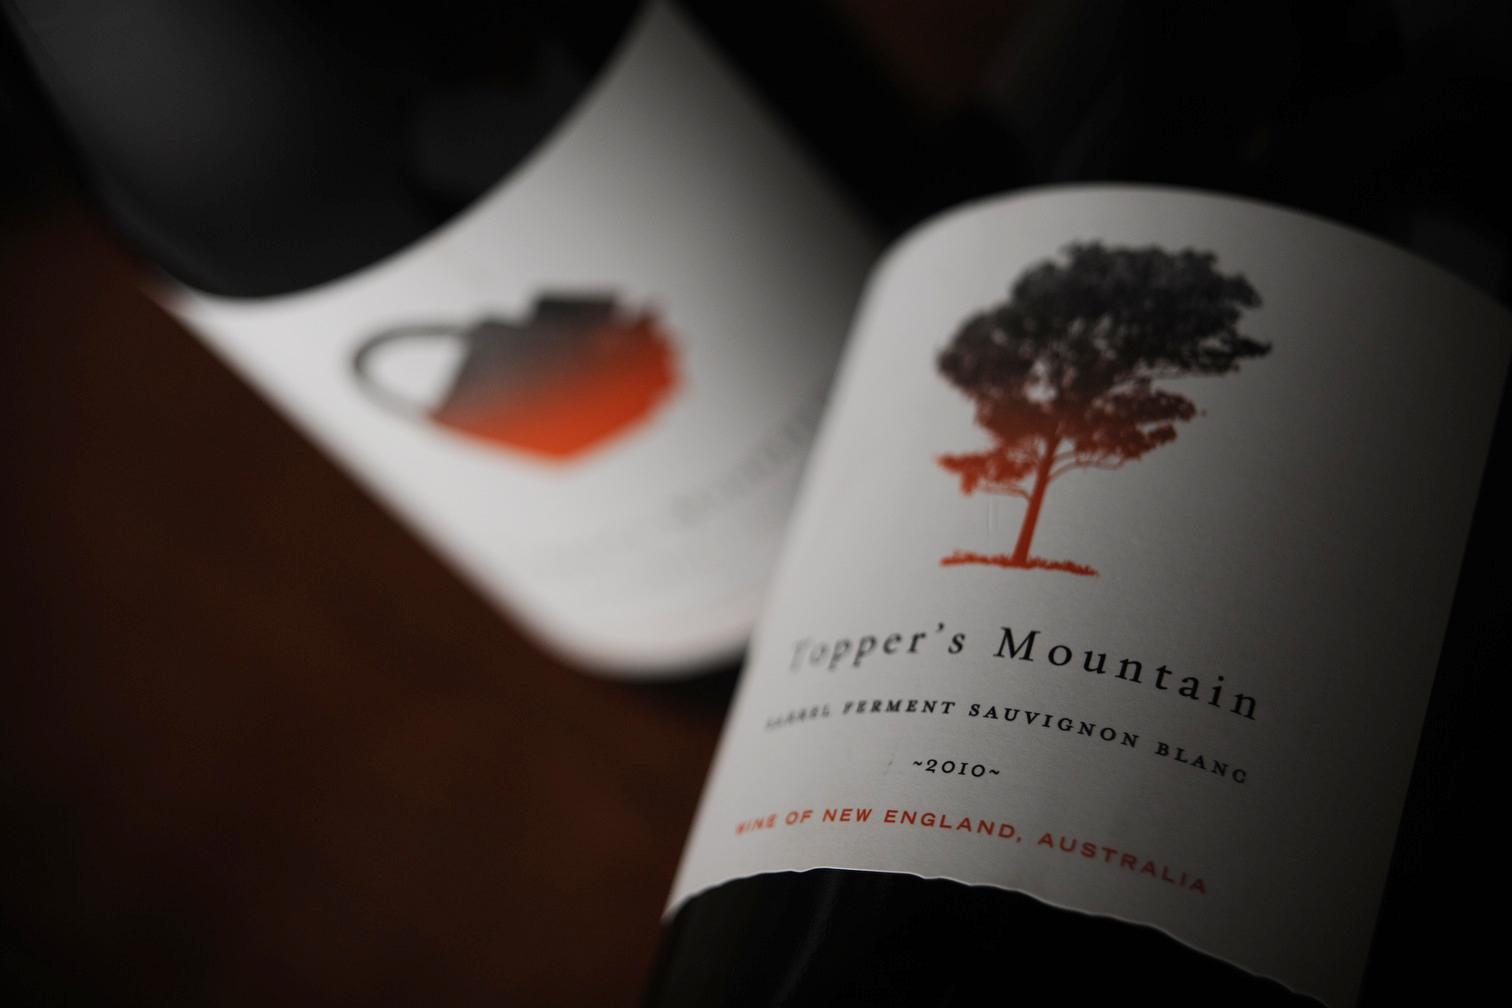 Topper's Mountain Art